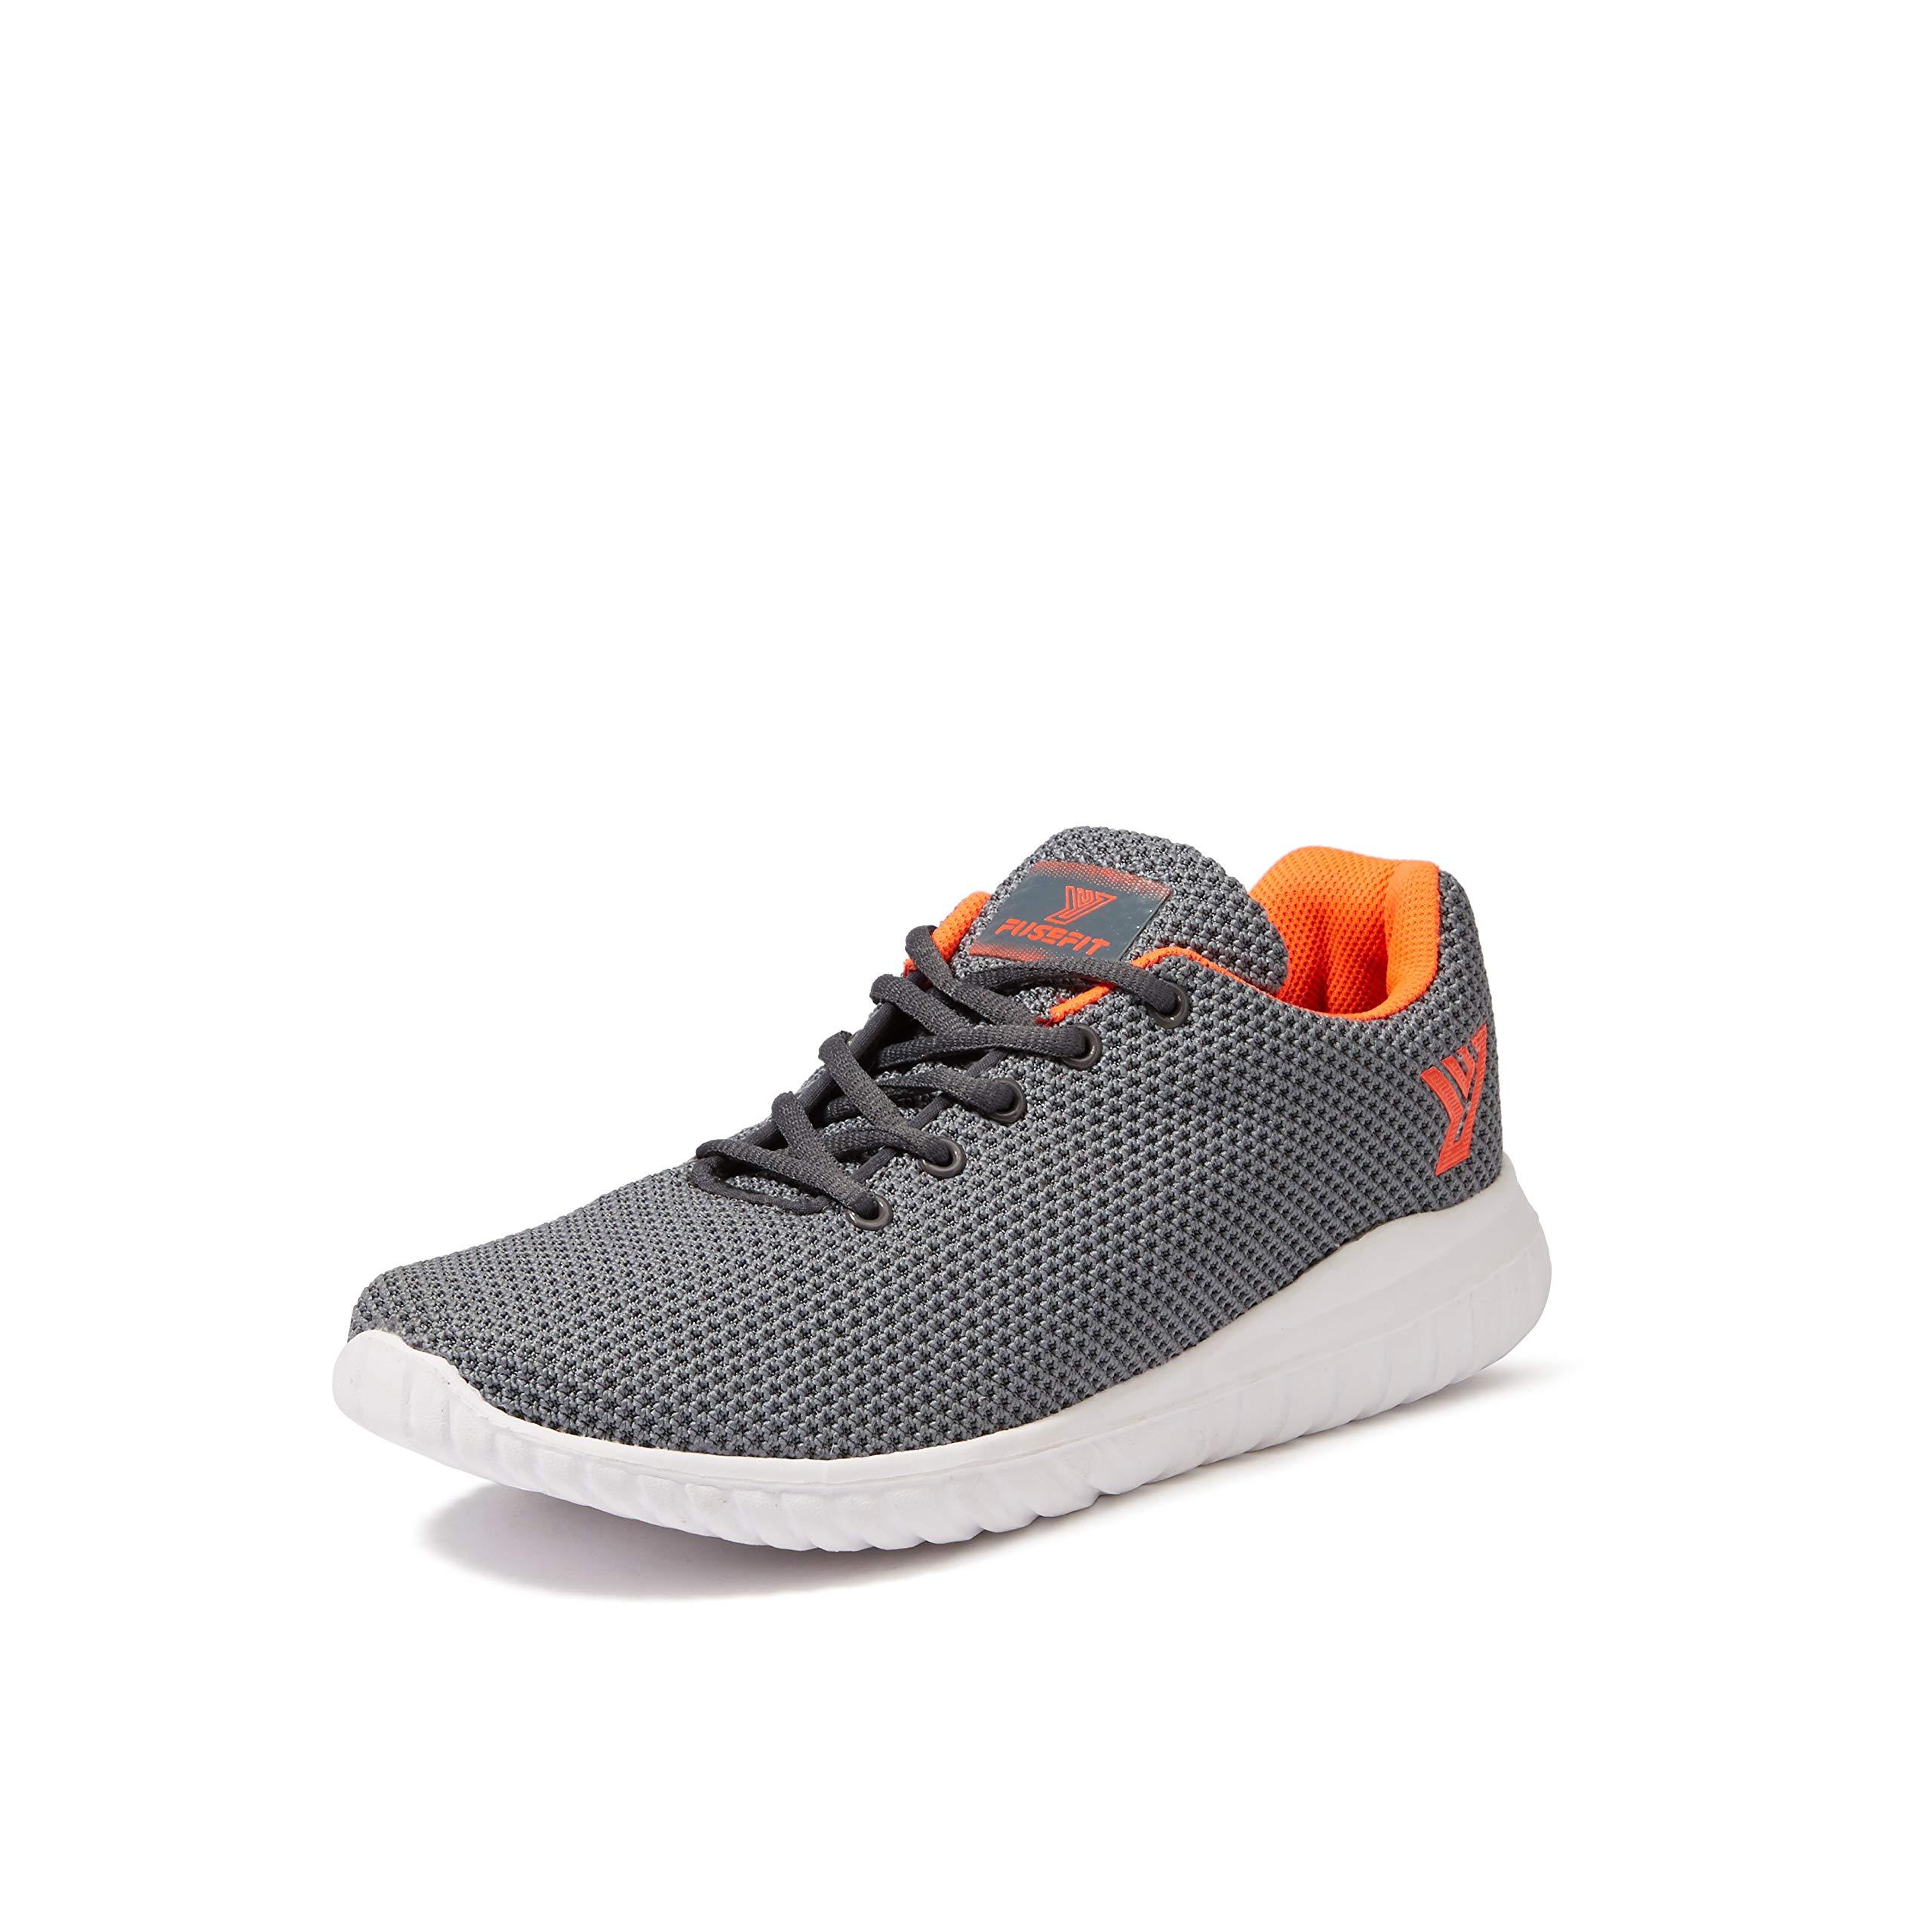 Amazon Price History for Fusefit Men's Duke Dk Grey/Orange Running Shoes-6 UK/India (40 EU) (FFR-129)